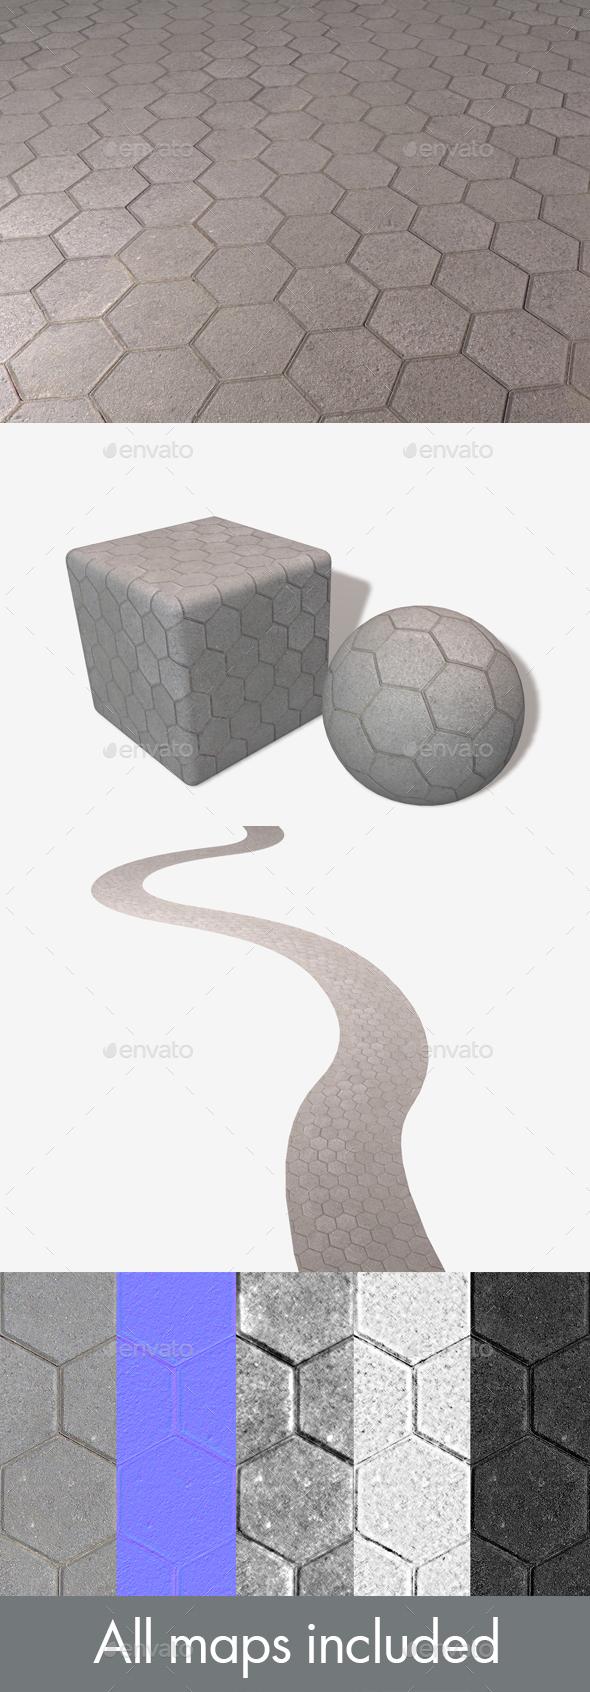 3DOcean Hexagon Paving Slabs Seamless Texture 20007760